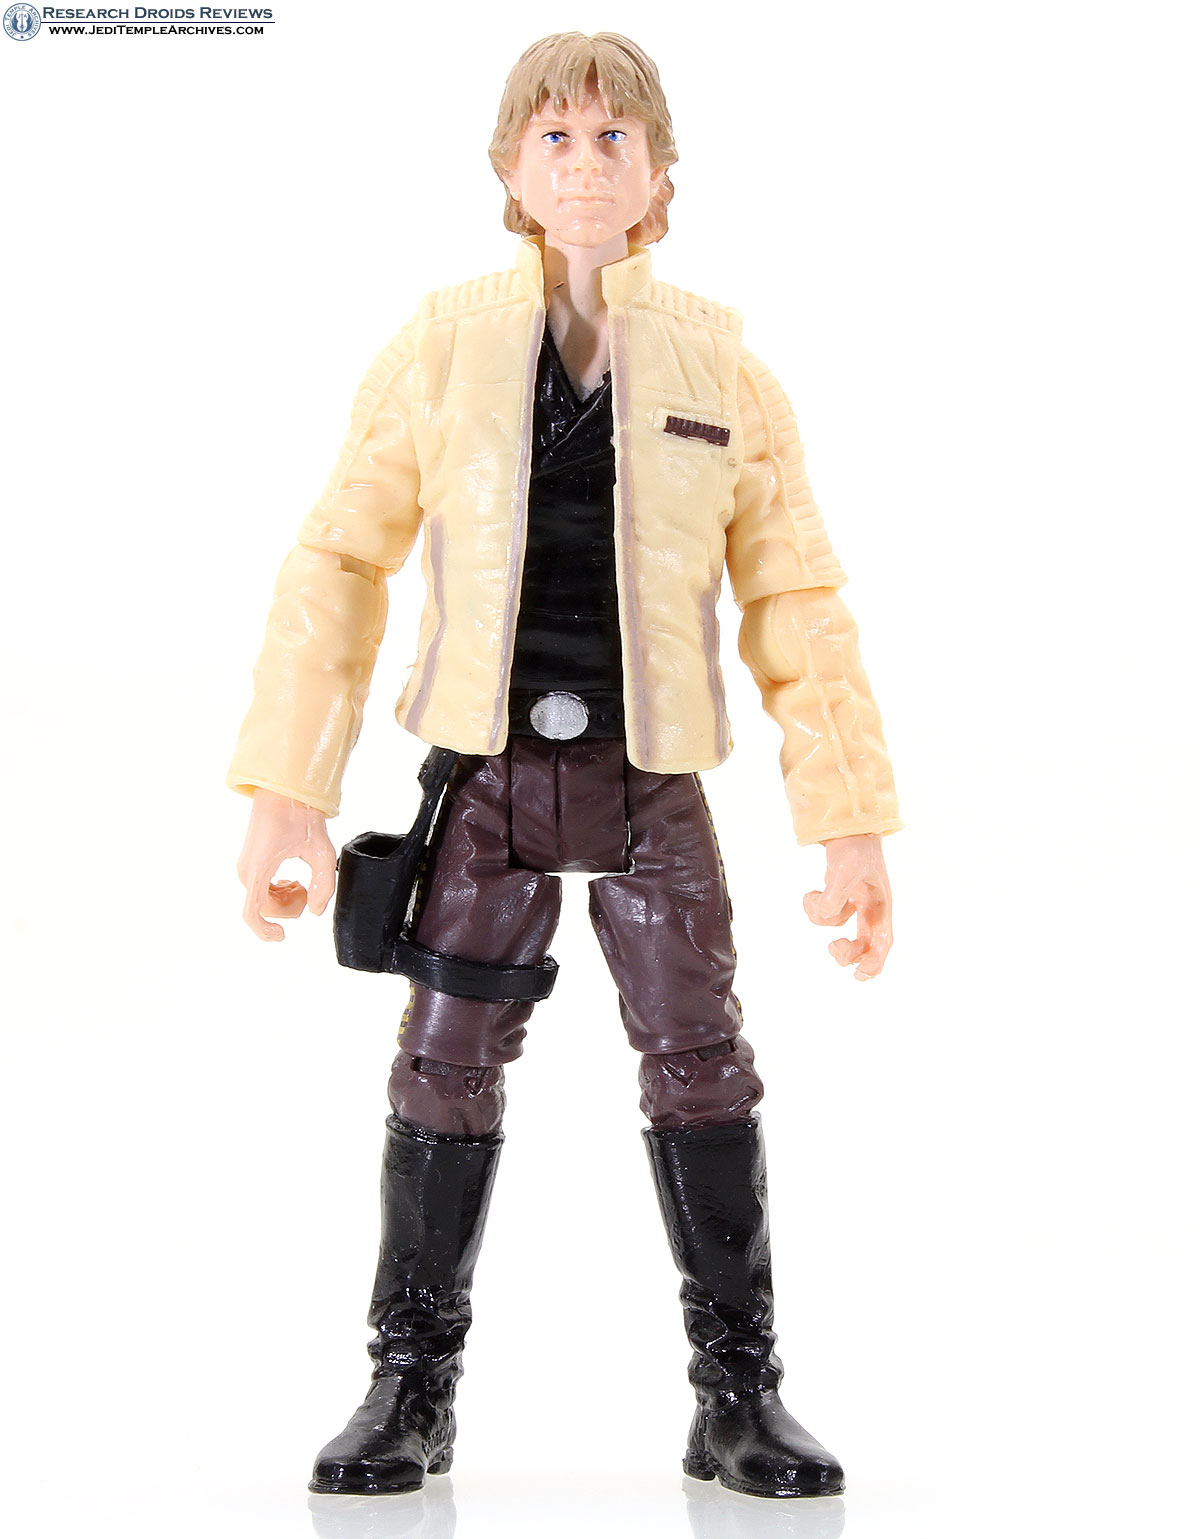 Luke Skywalker Ceremonial Outfit